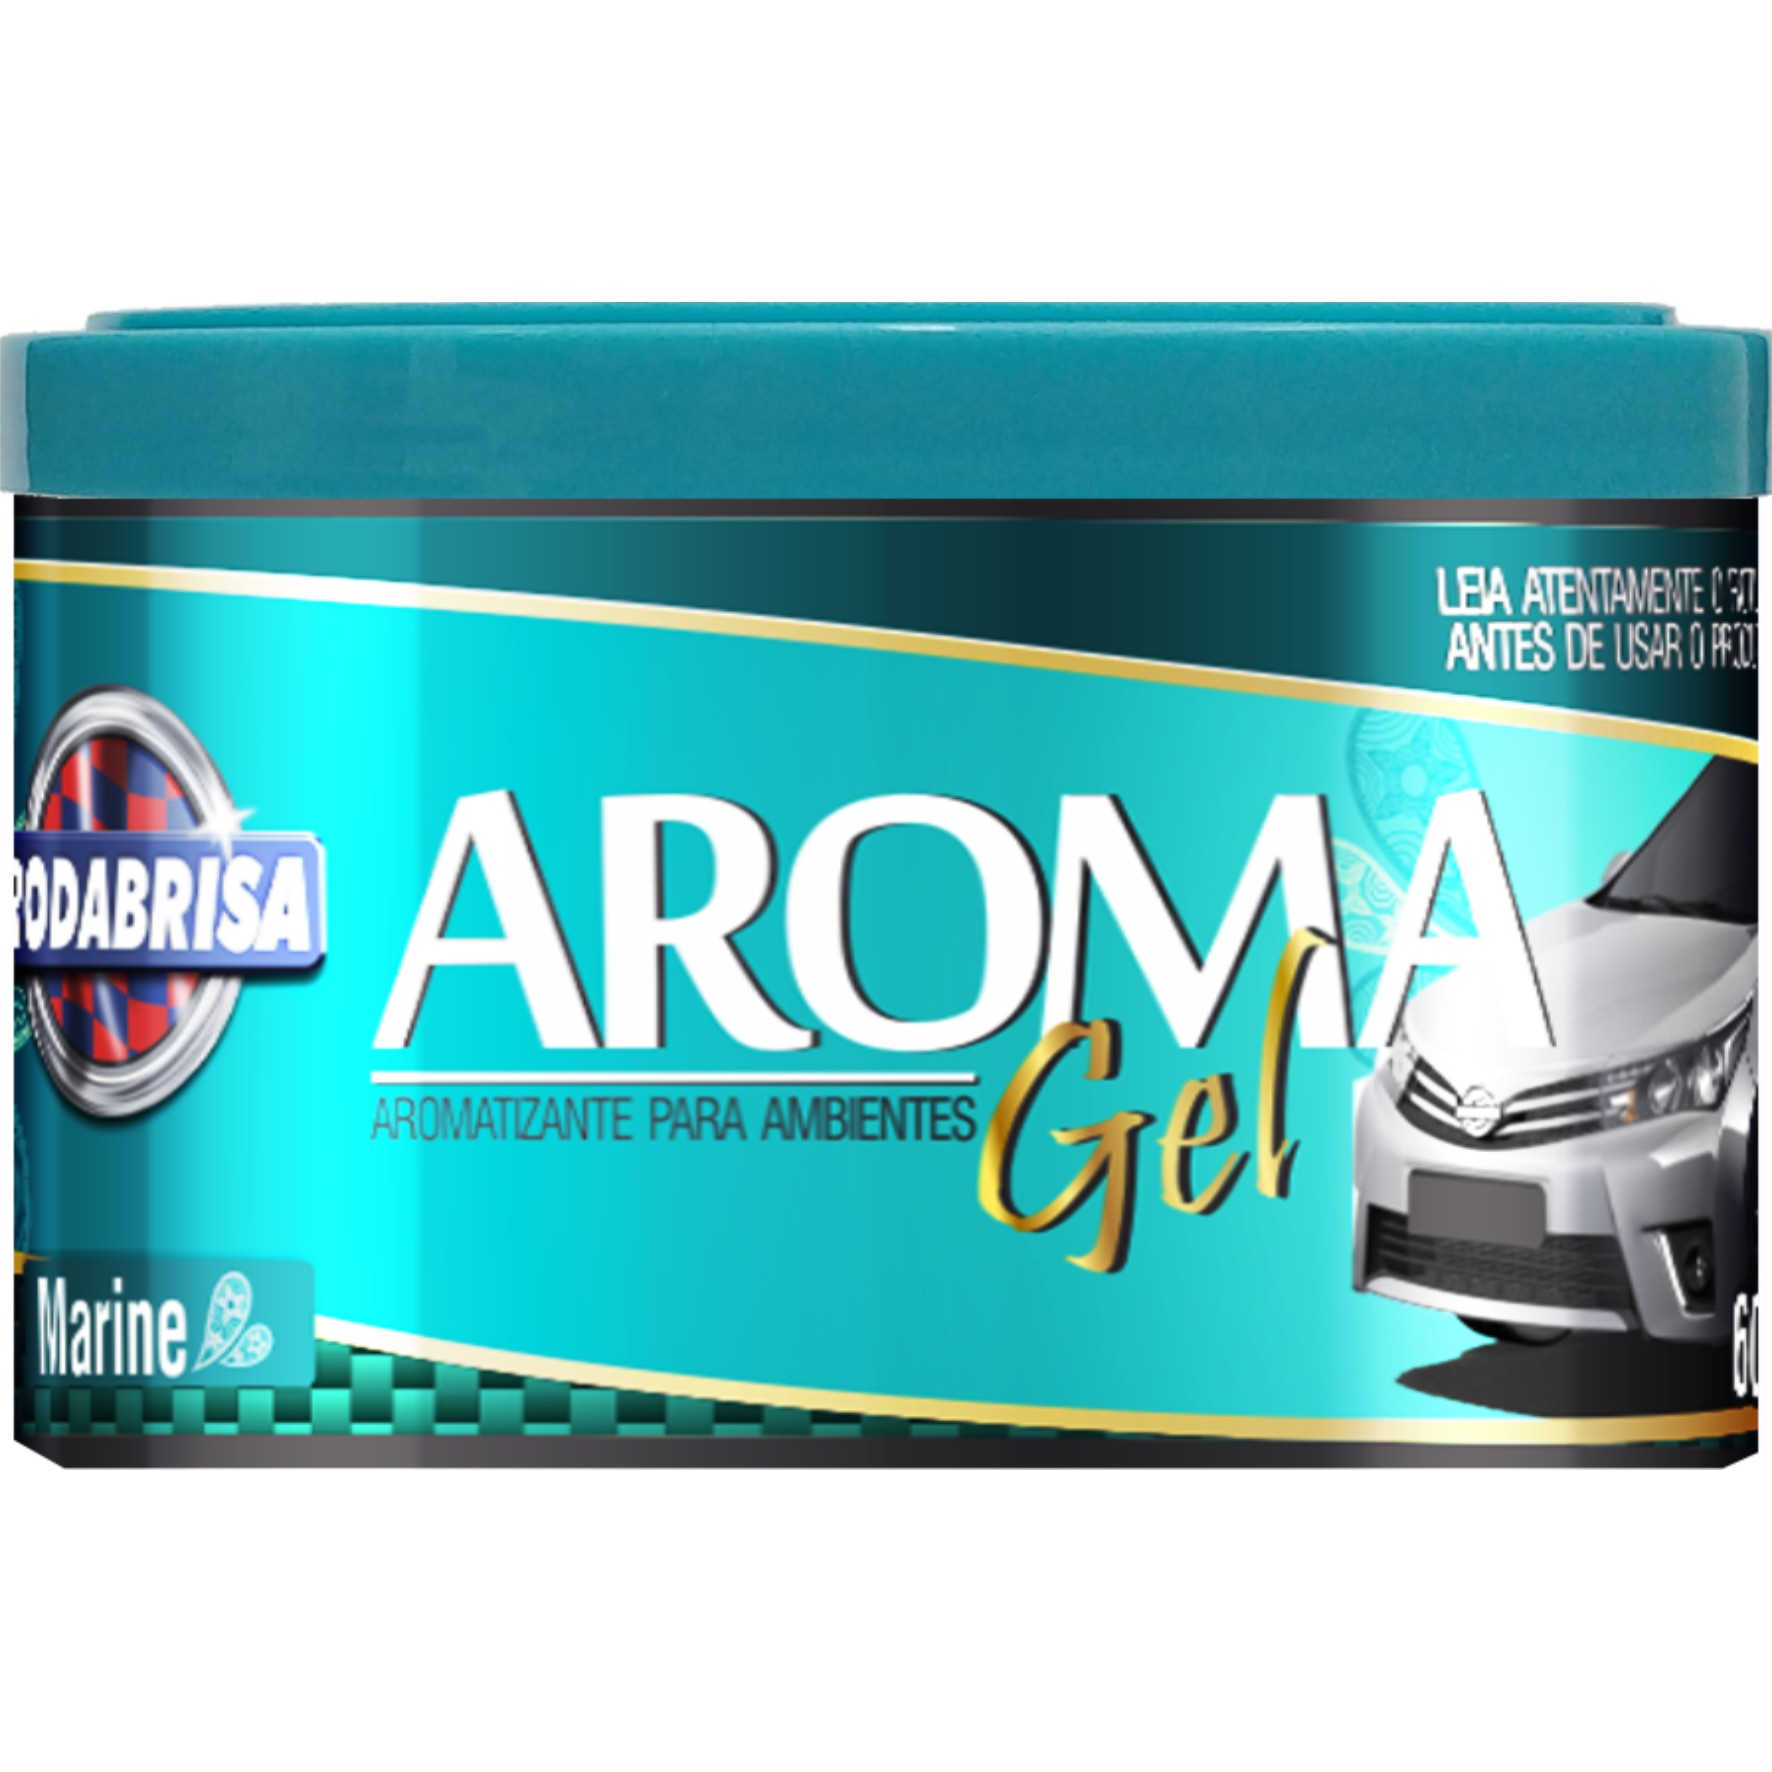 Aromatizante Gel Fragrancia Action 60g - Rodabrisa